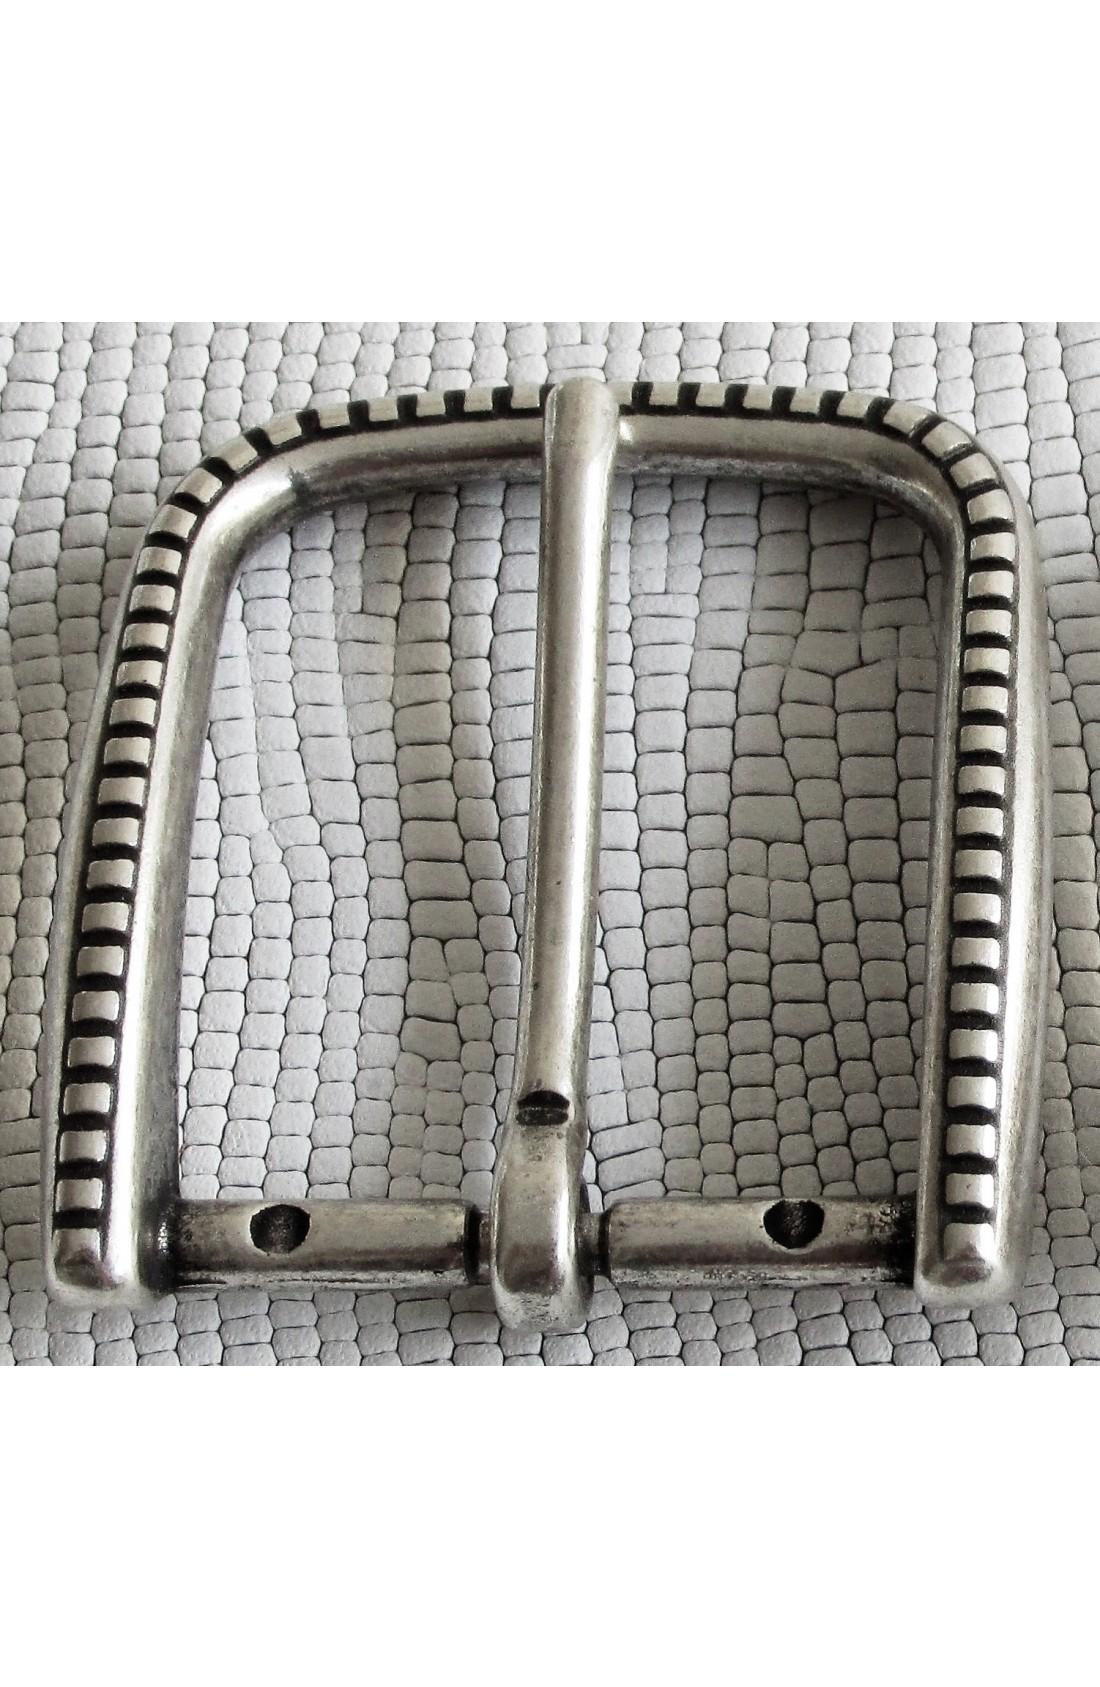 Fibbia Standard I 186 mm.35 argento inglese free